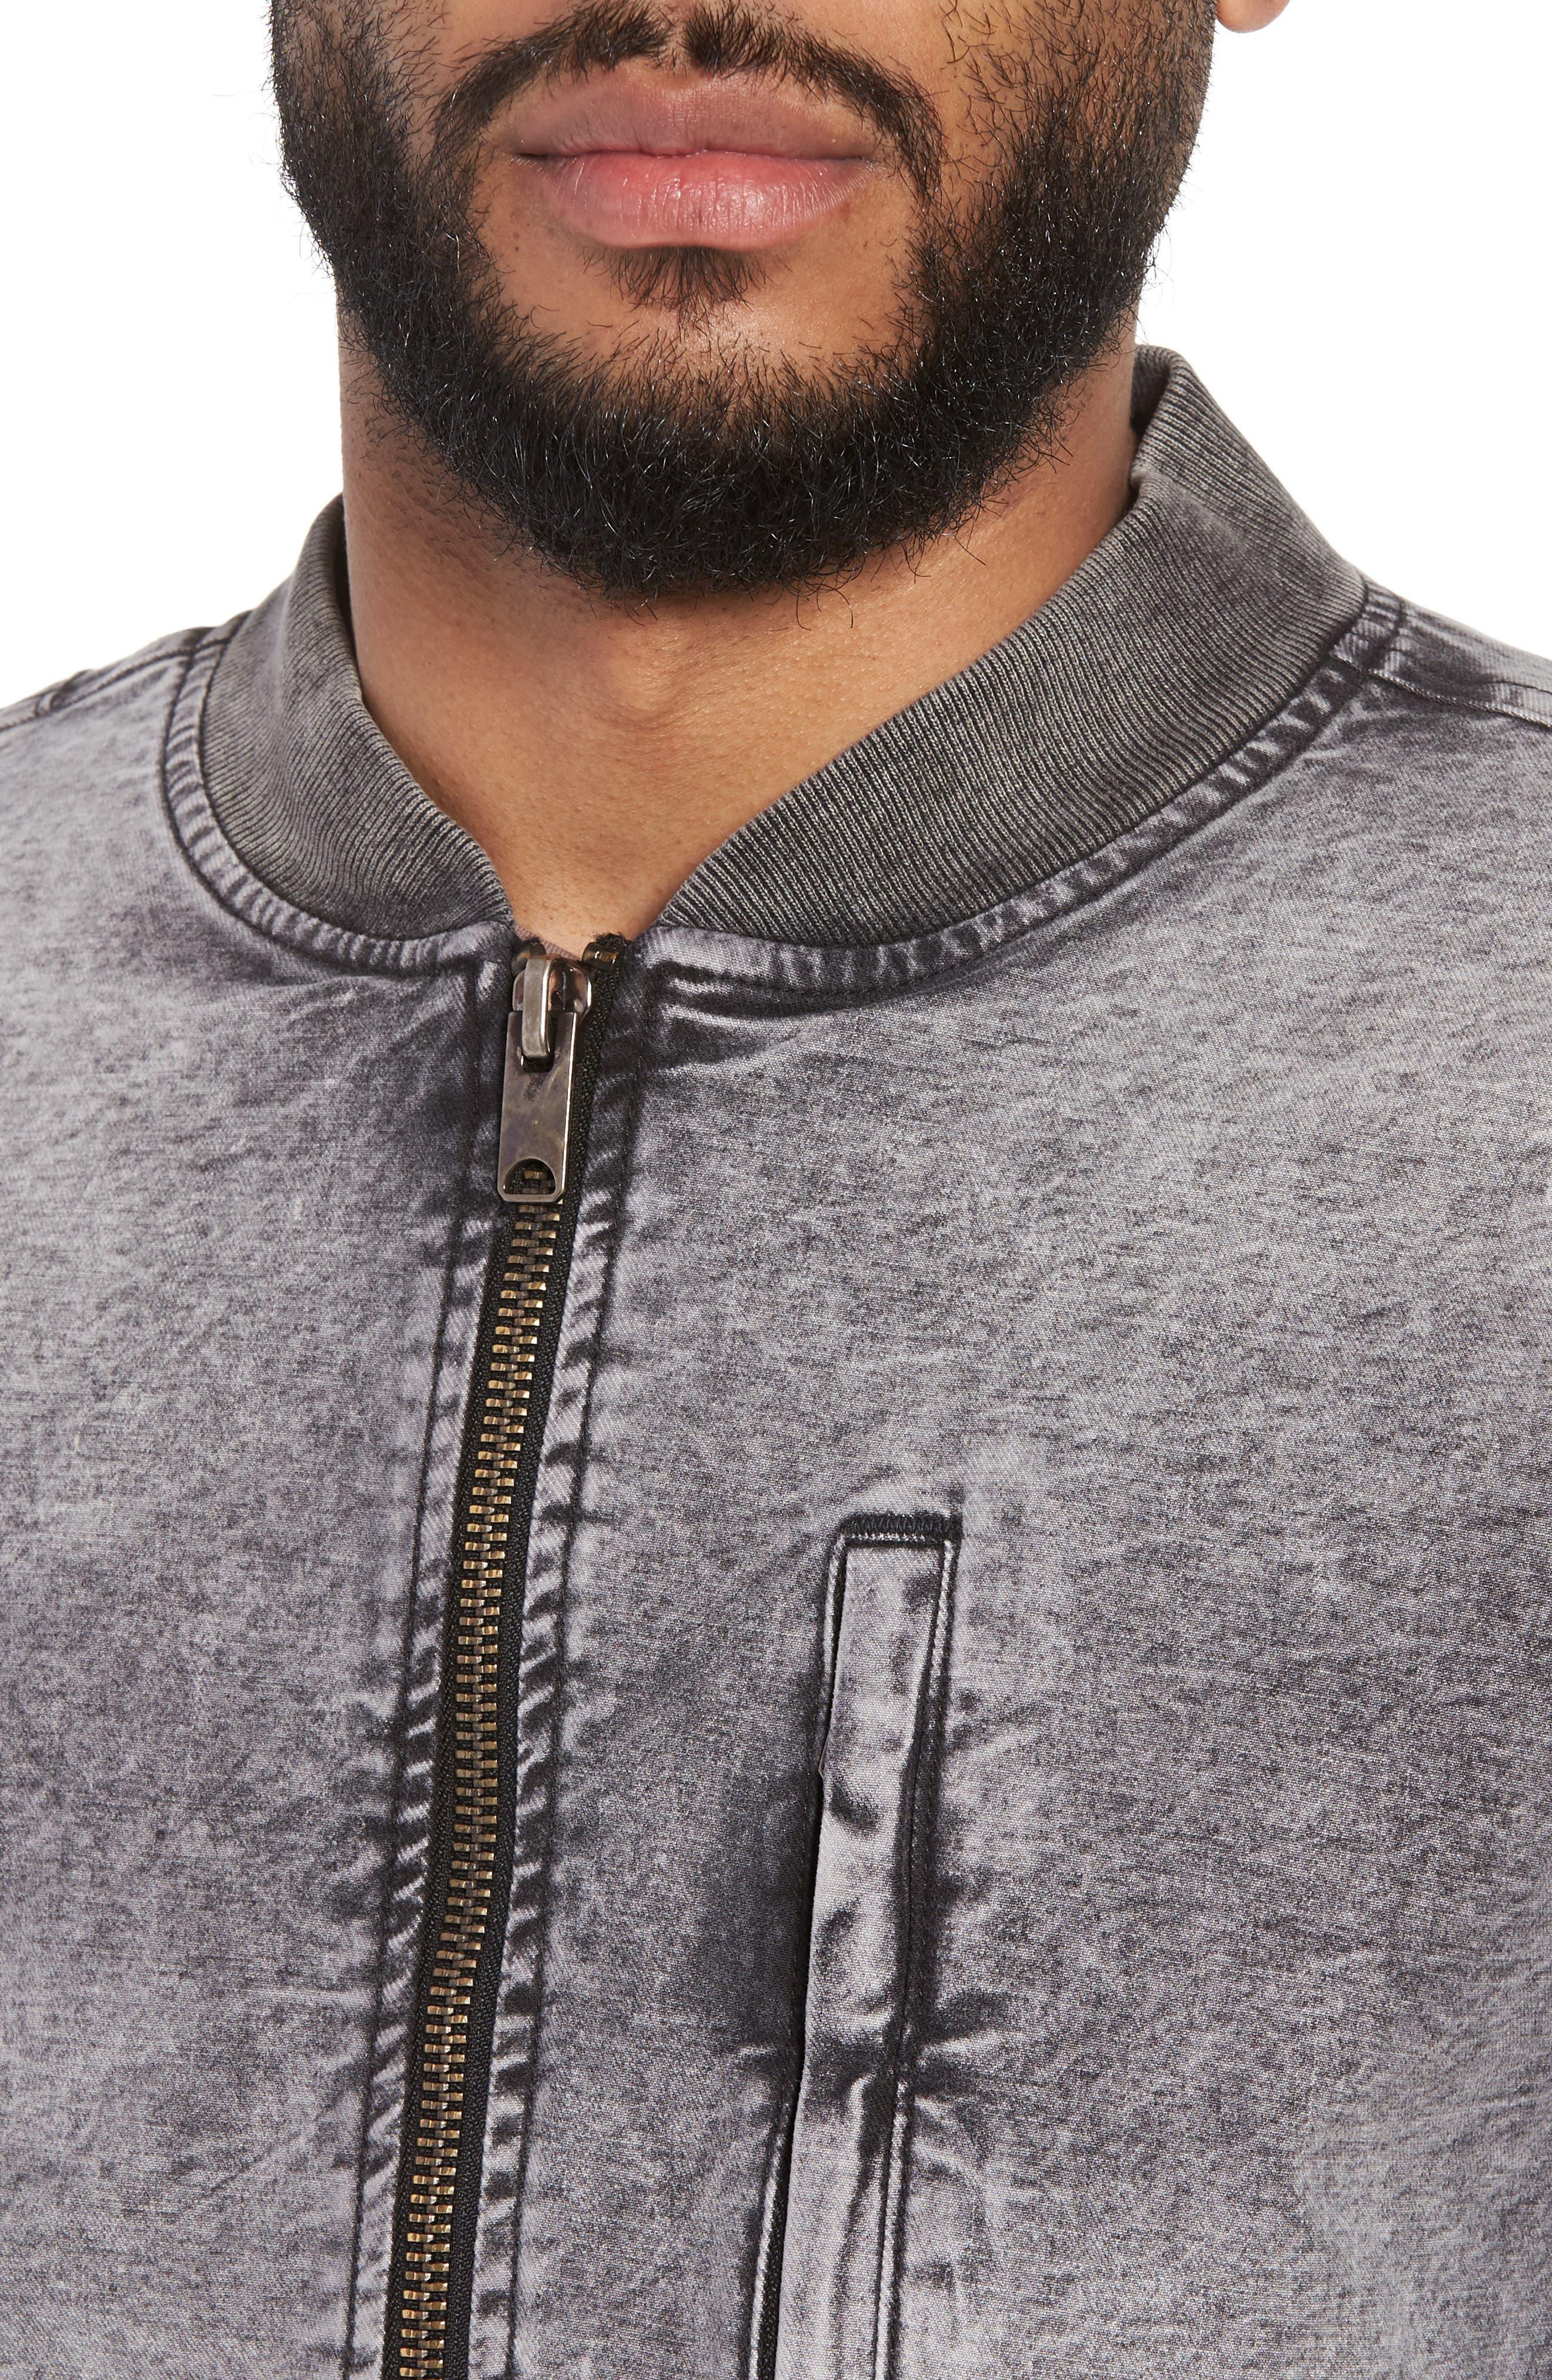 Hudson Regular Fit Bomber Jacket,                             Alternate thumbnail 4, color,                             Mineral Black